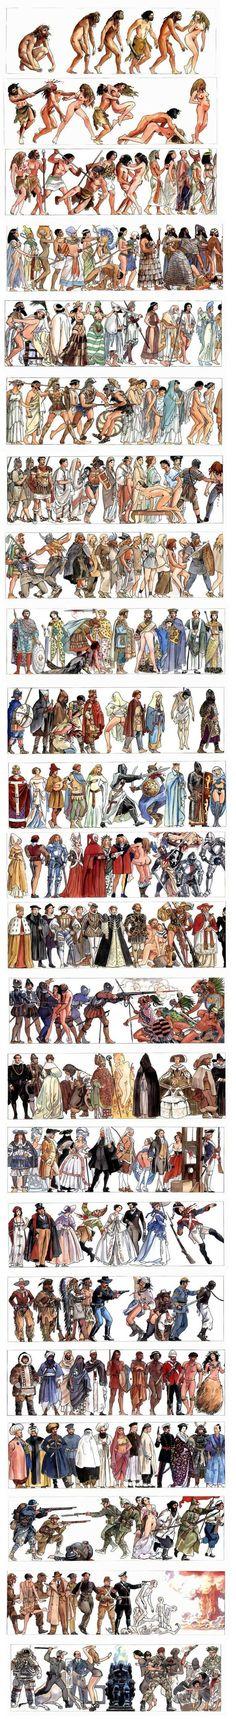 evolution of history